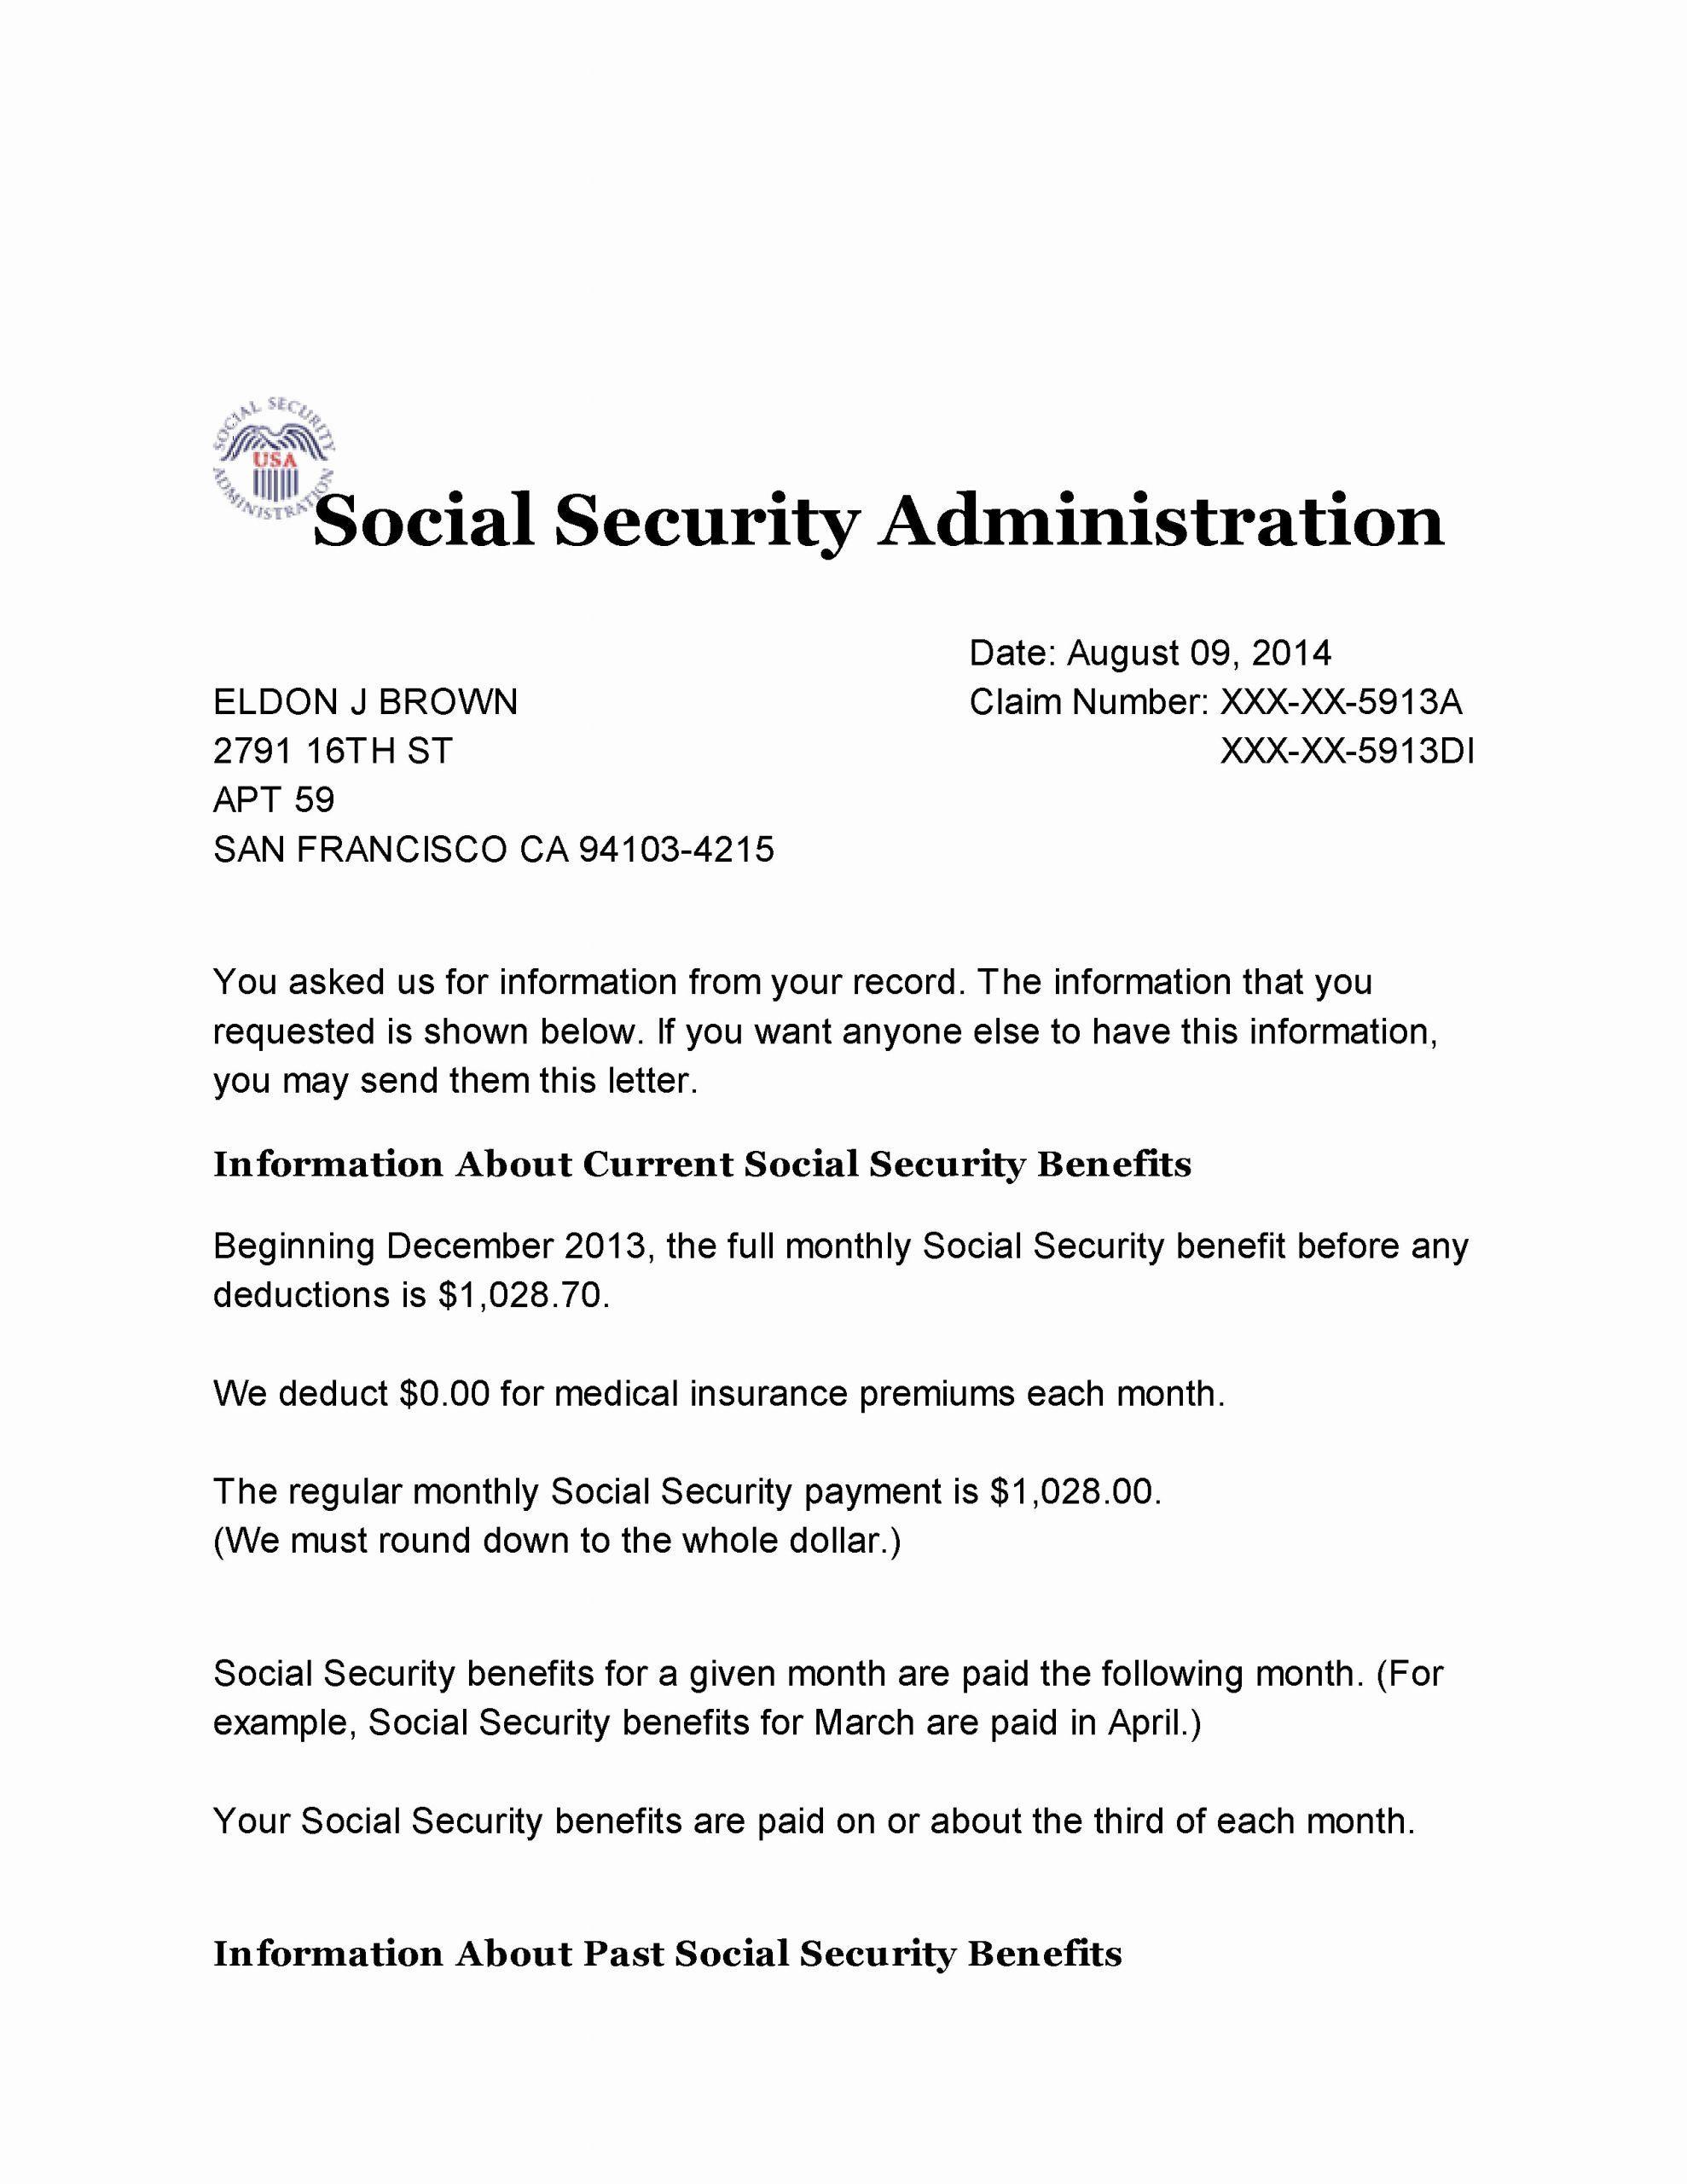 Benefits Verification Letter Inspirational Social Security Benefit Letter Lettering Letter Templates Social Security Benefits